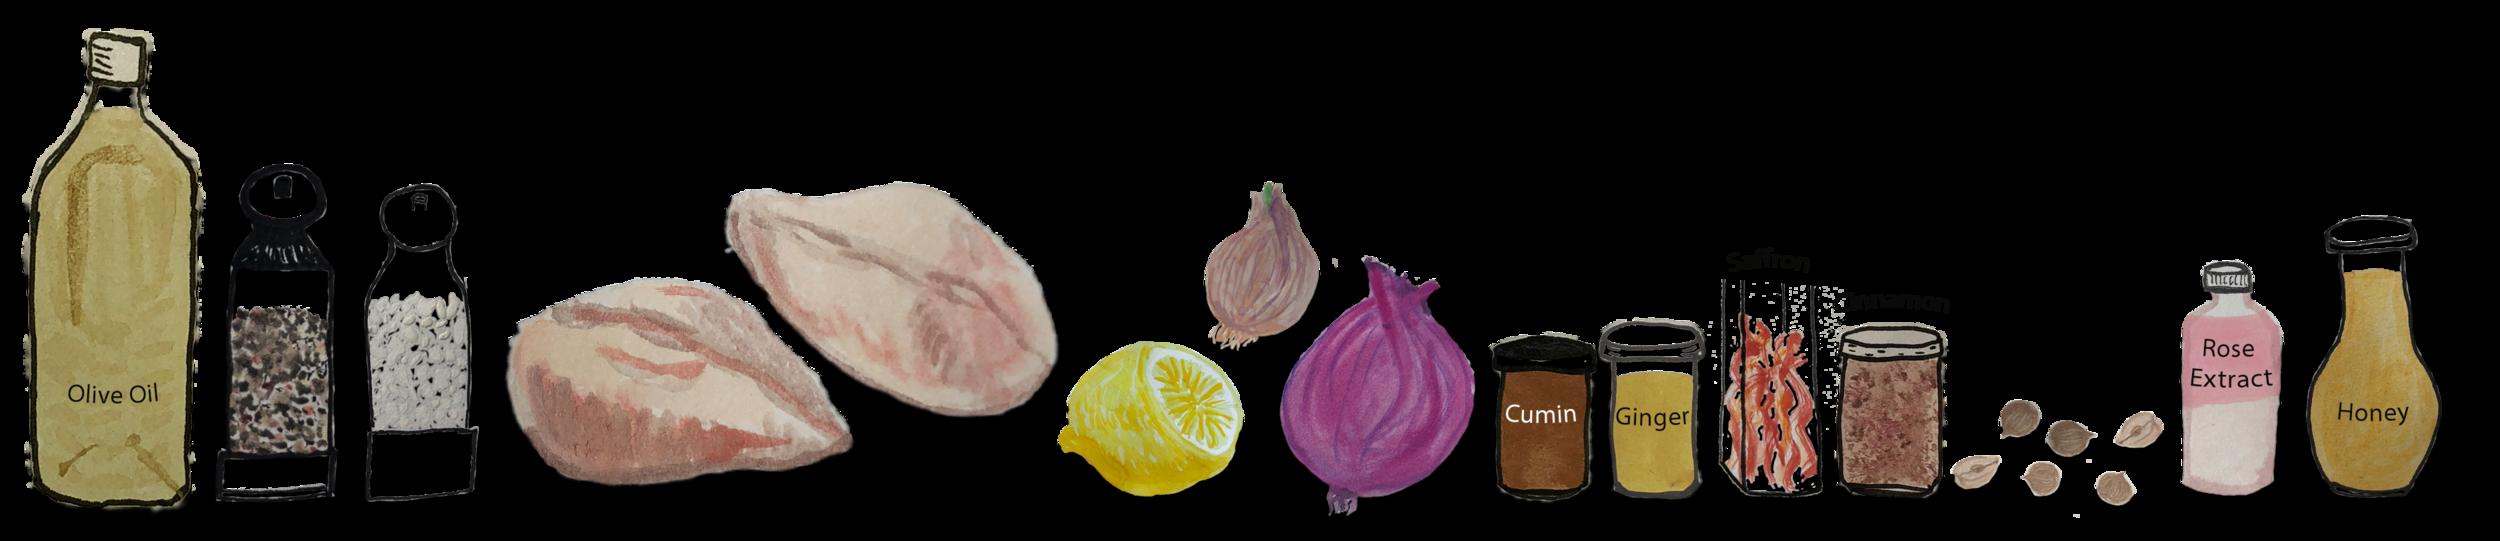 saffronchickenbottom2.png